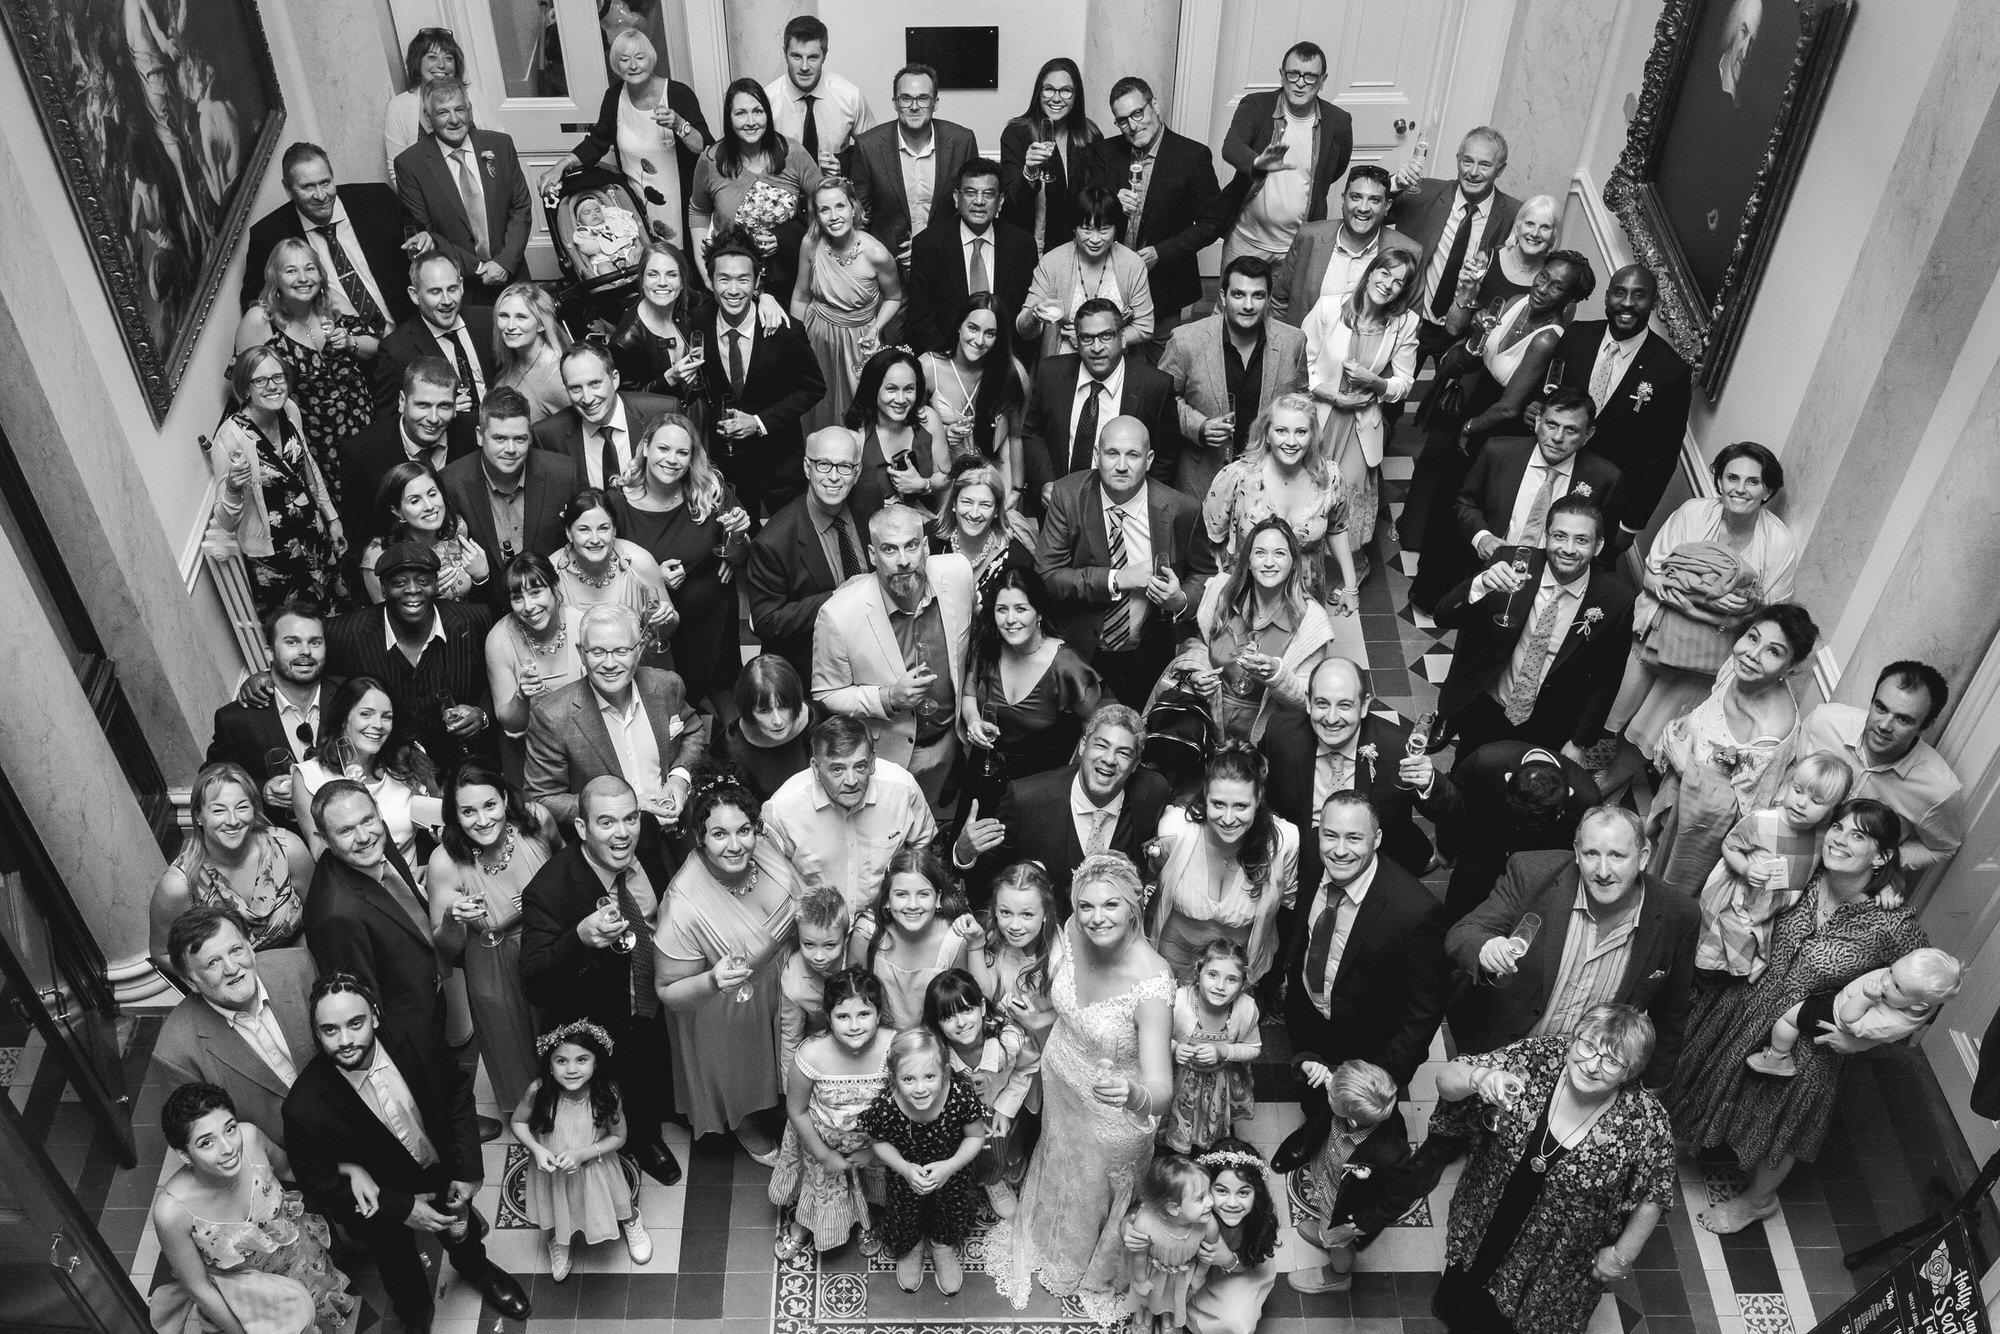 Leonardslee Gardens weddings